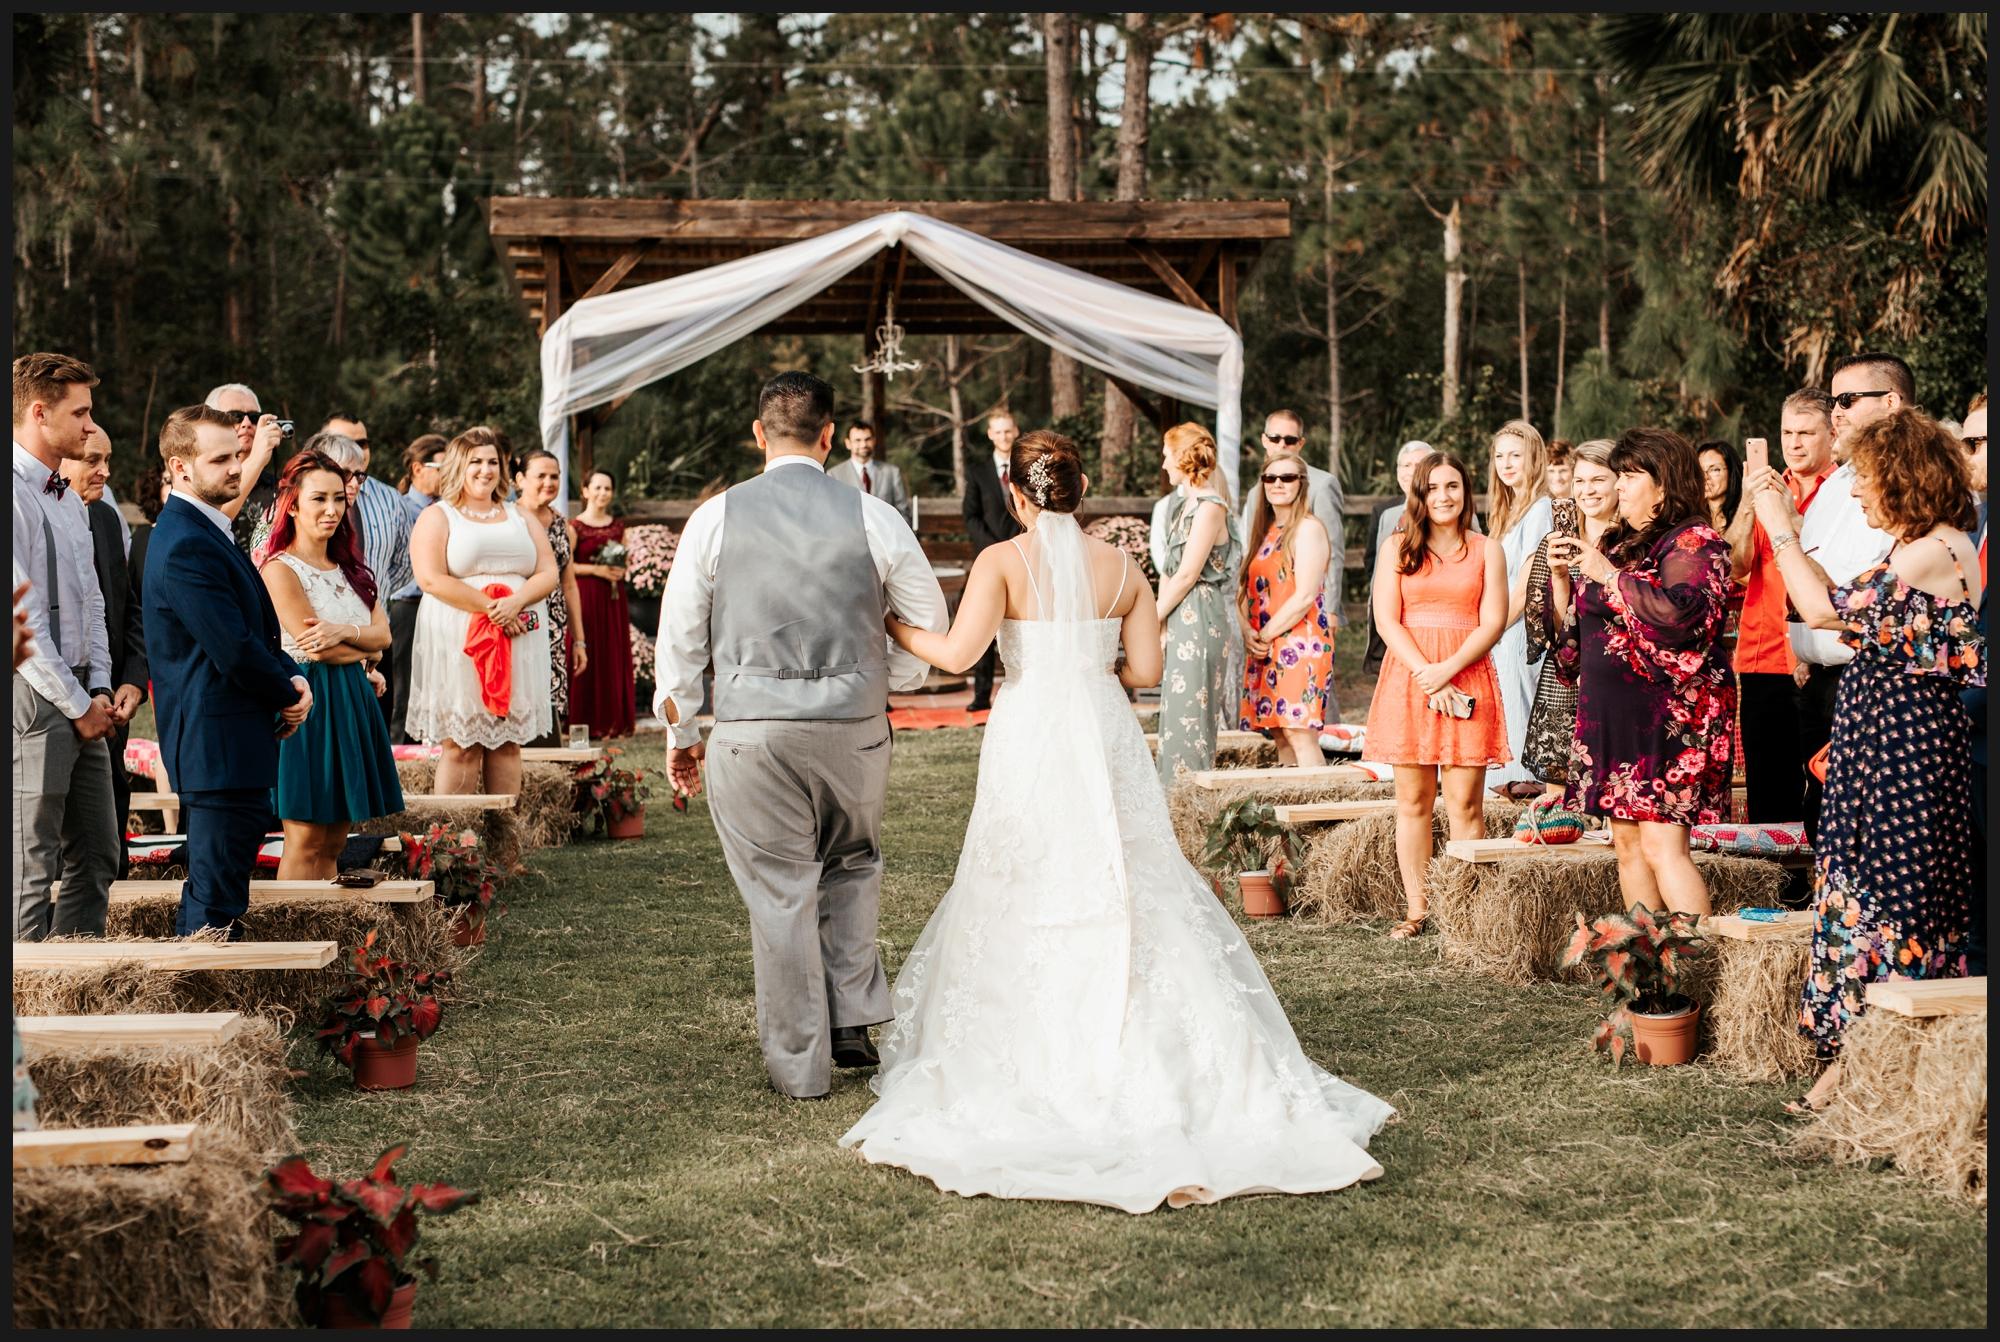 Orlando-Wedding-Photographer-destination-wedding-photographer-florida-wedding-photographer-bohemian-wedding-photographer_0341.jpg